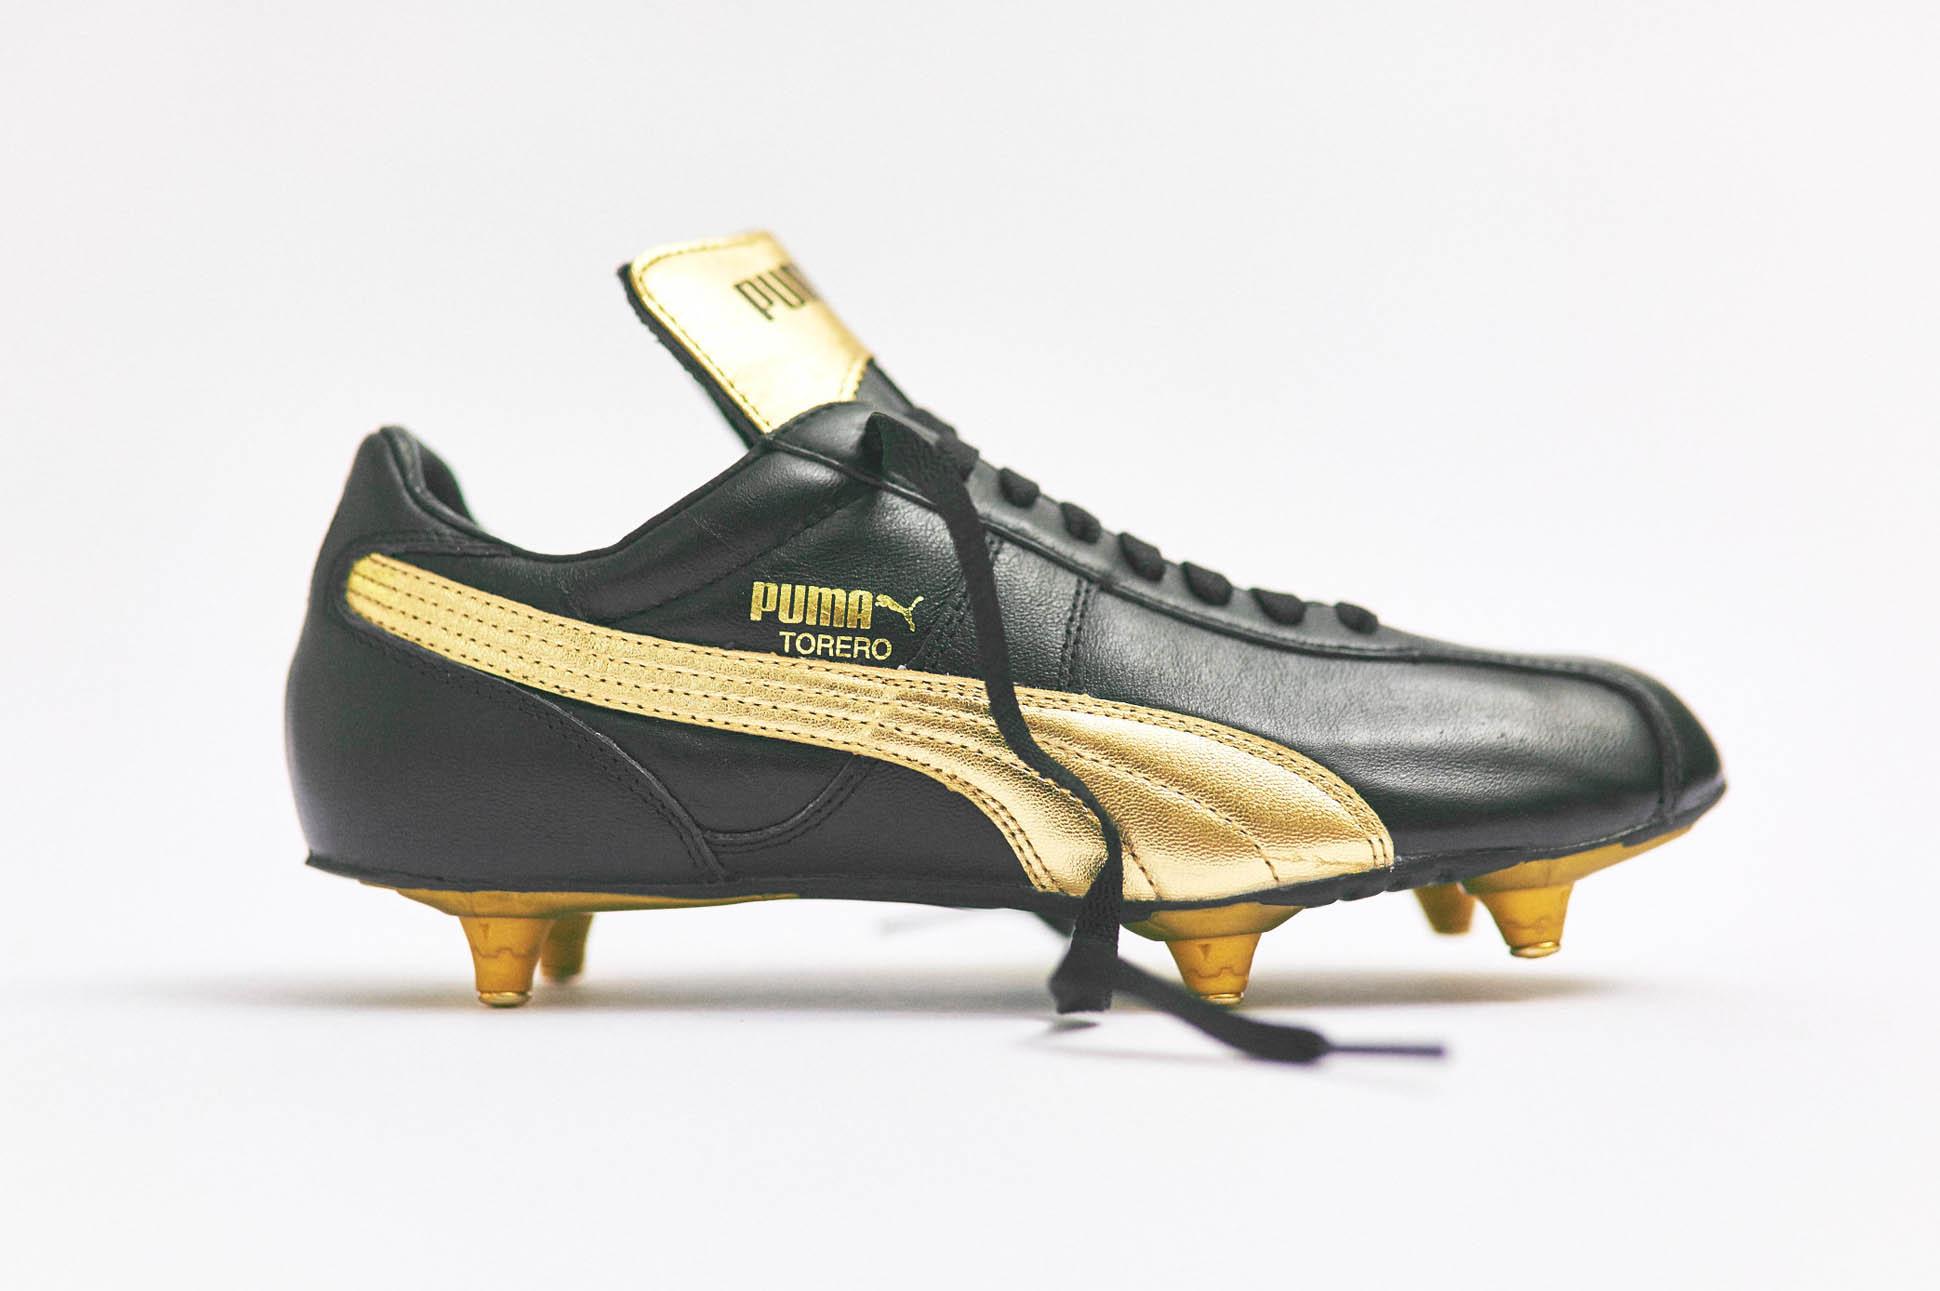 6023feaaeff2 PUMA King Torero Special Edition Football Boots - SoccerBible